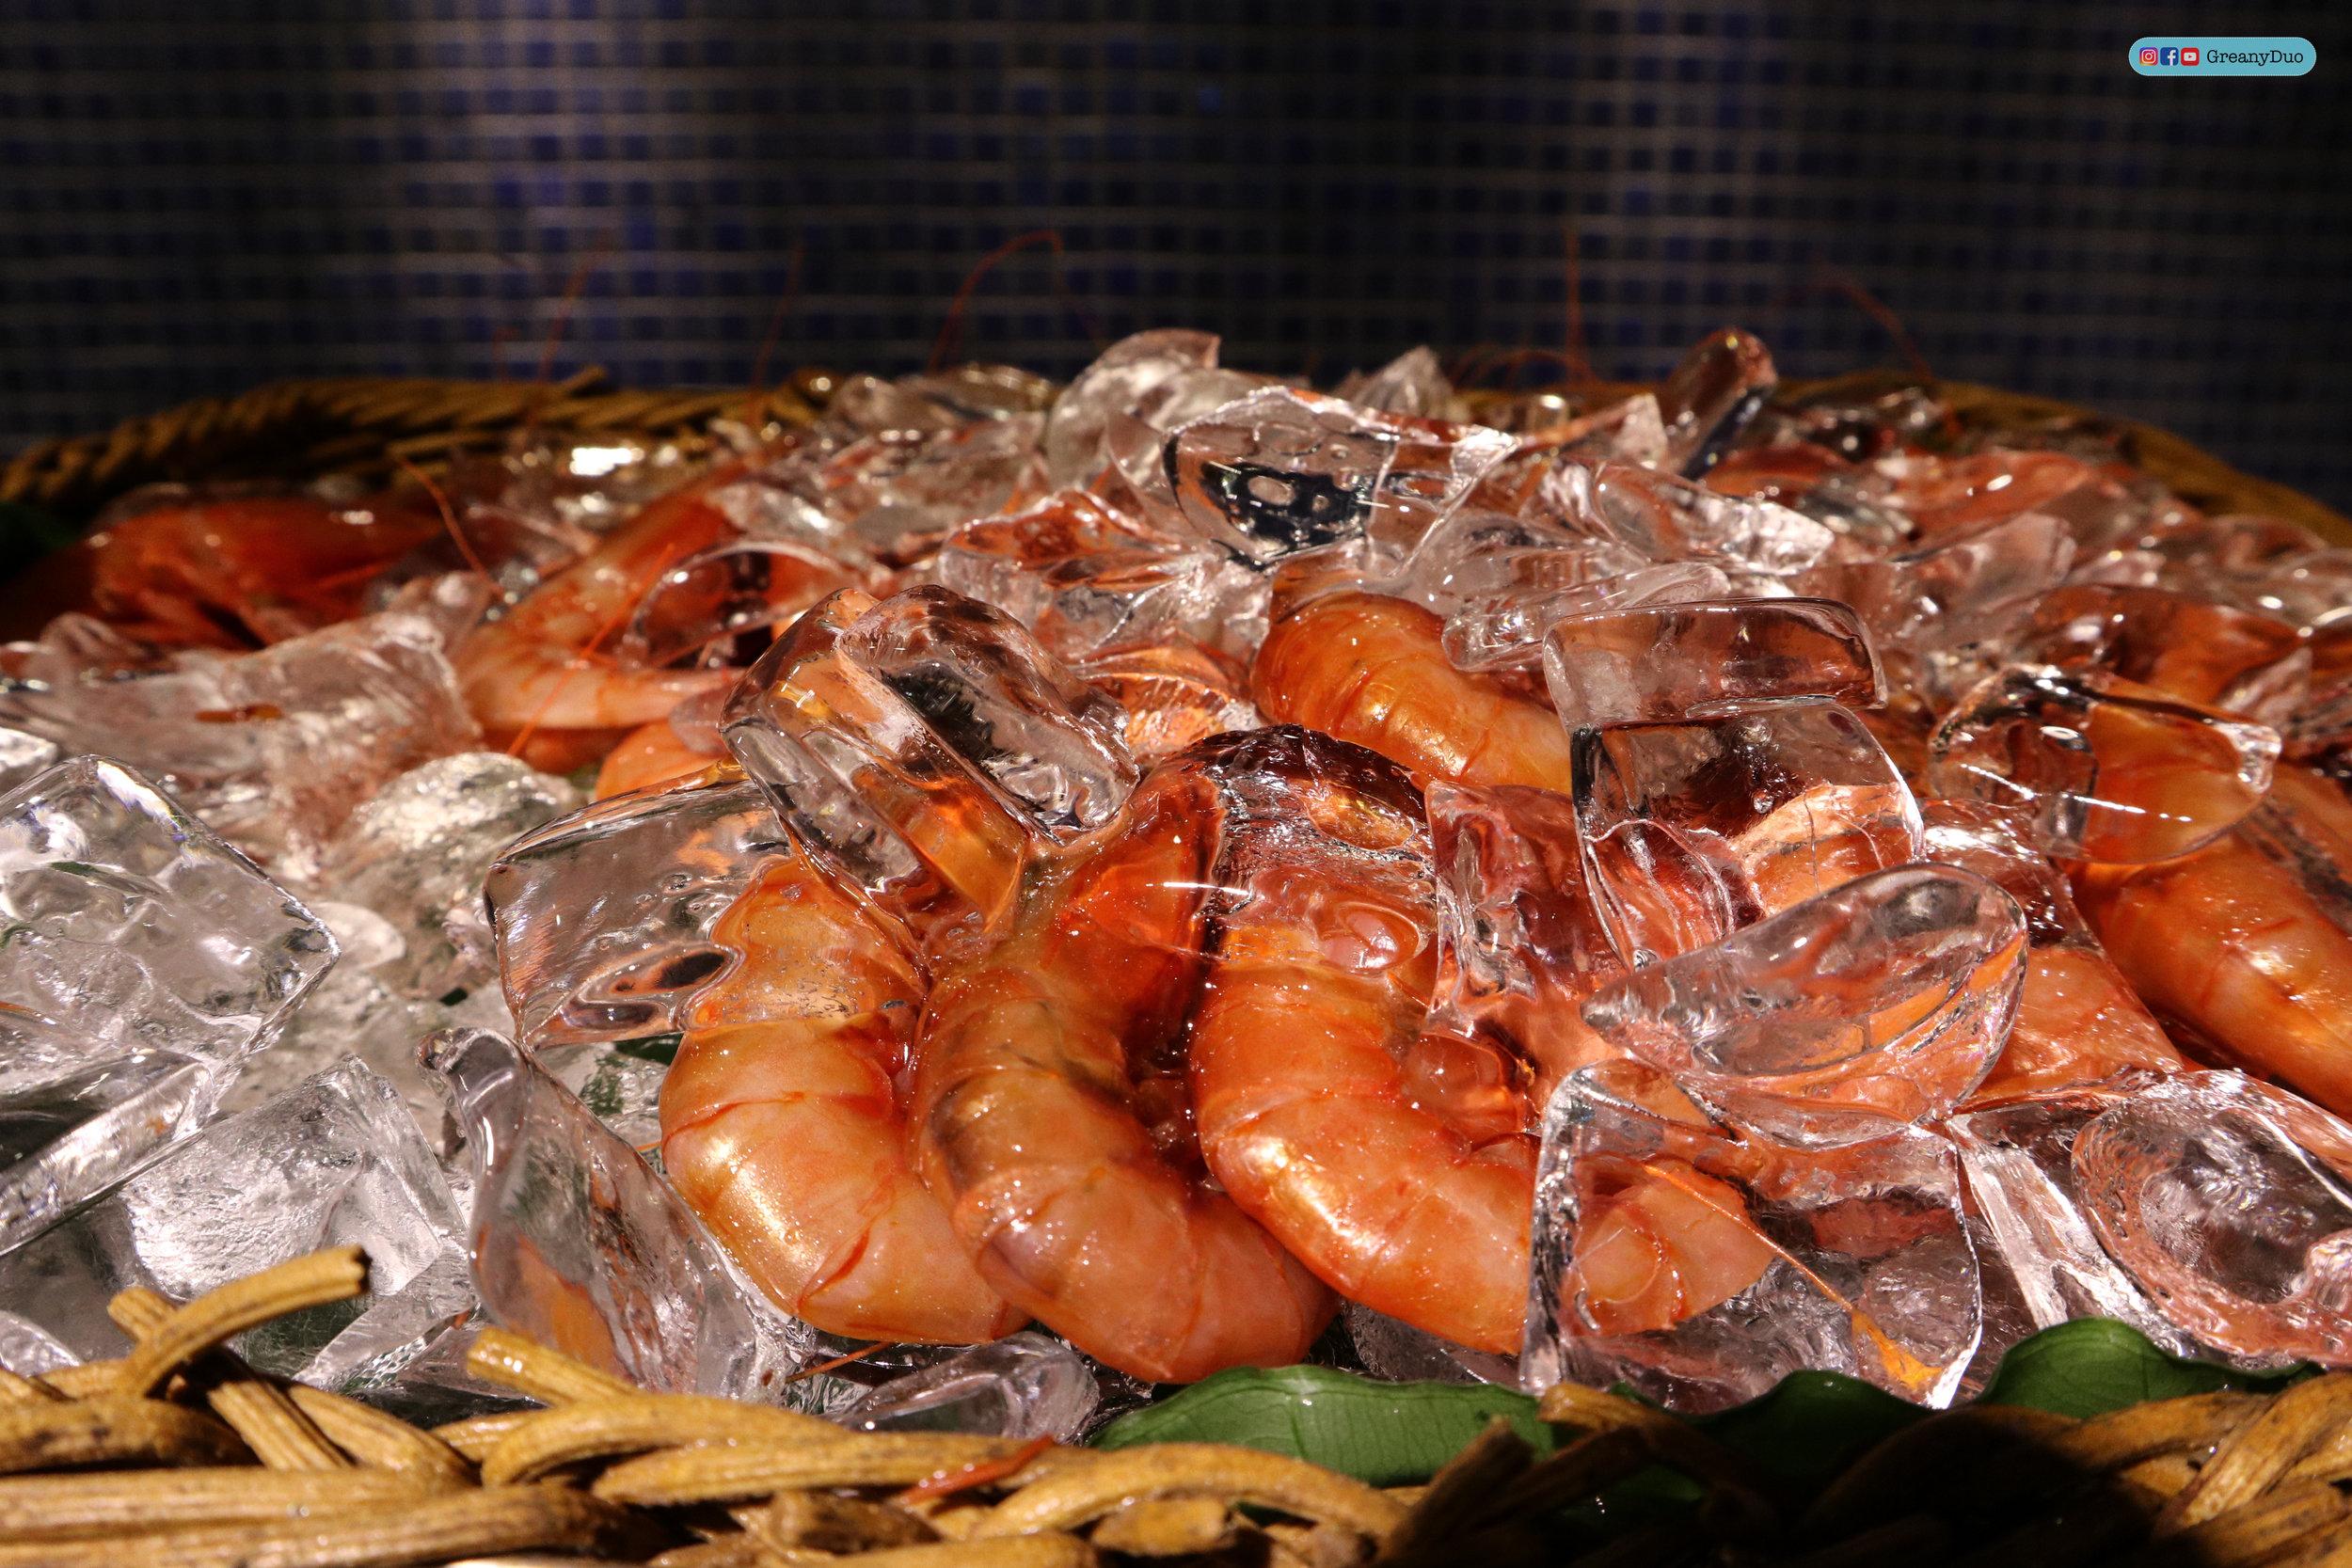 fresh shrimps at บุฟเฟ่ต์ชาบูไต้หวันที่ Hakkai Shabu Shabu ซีเหมินติง